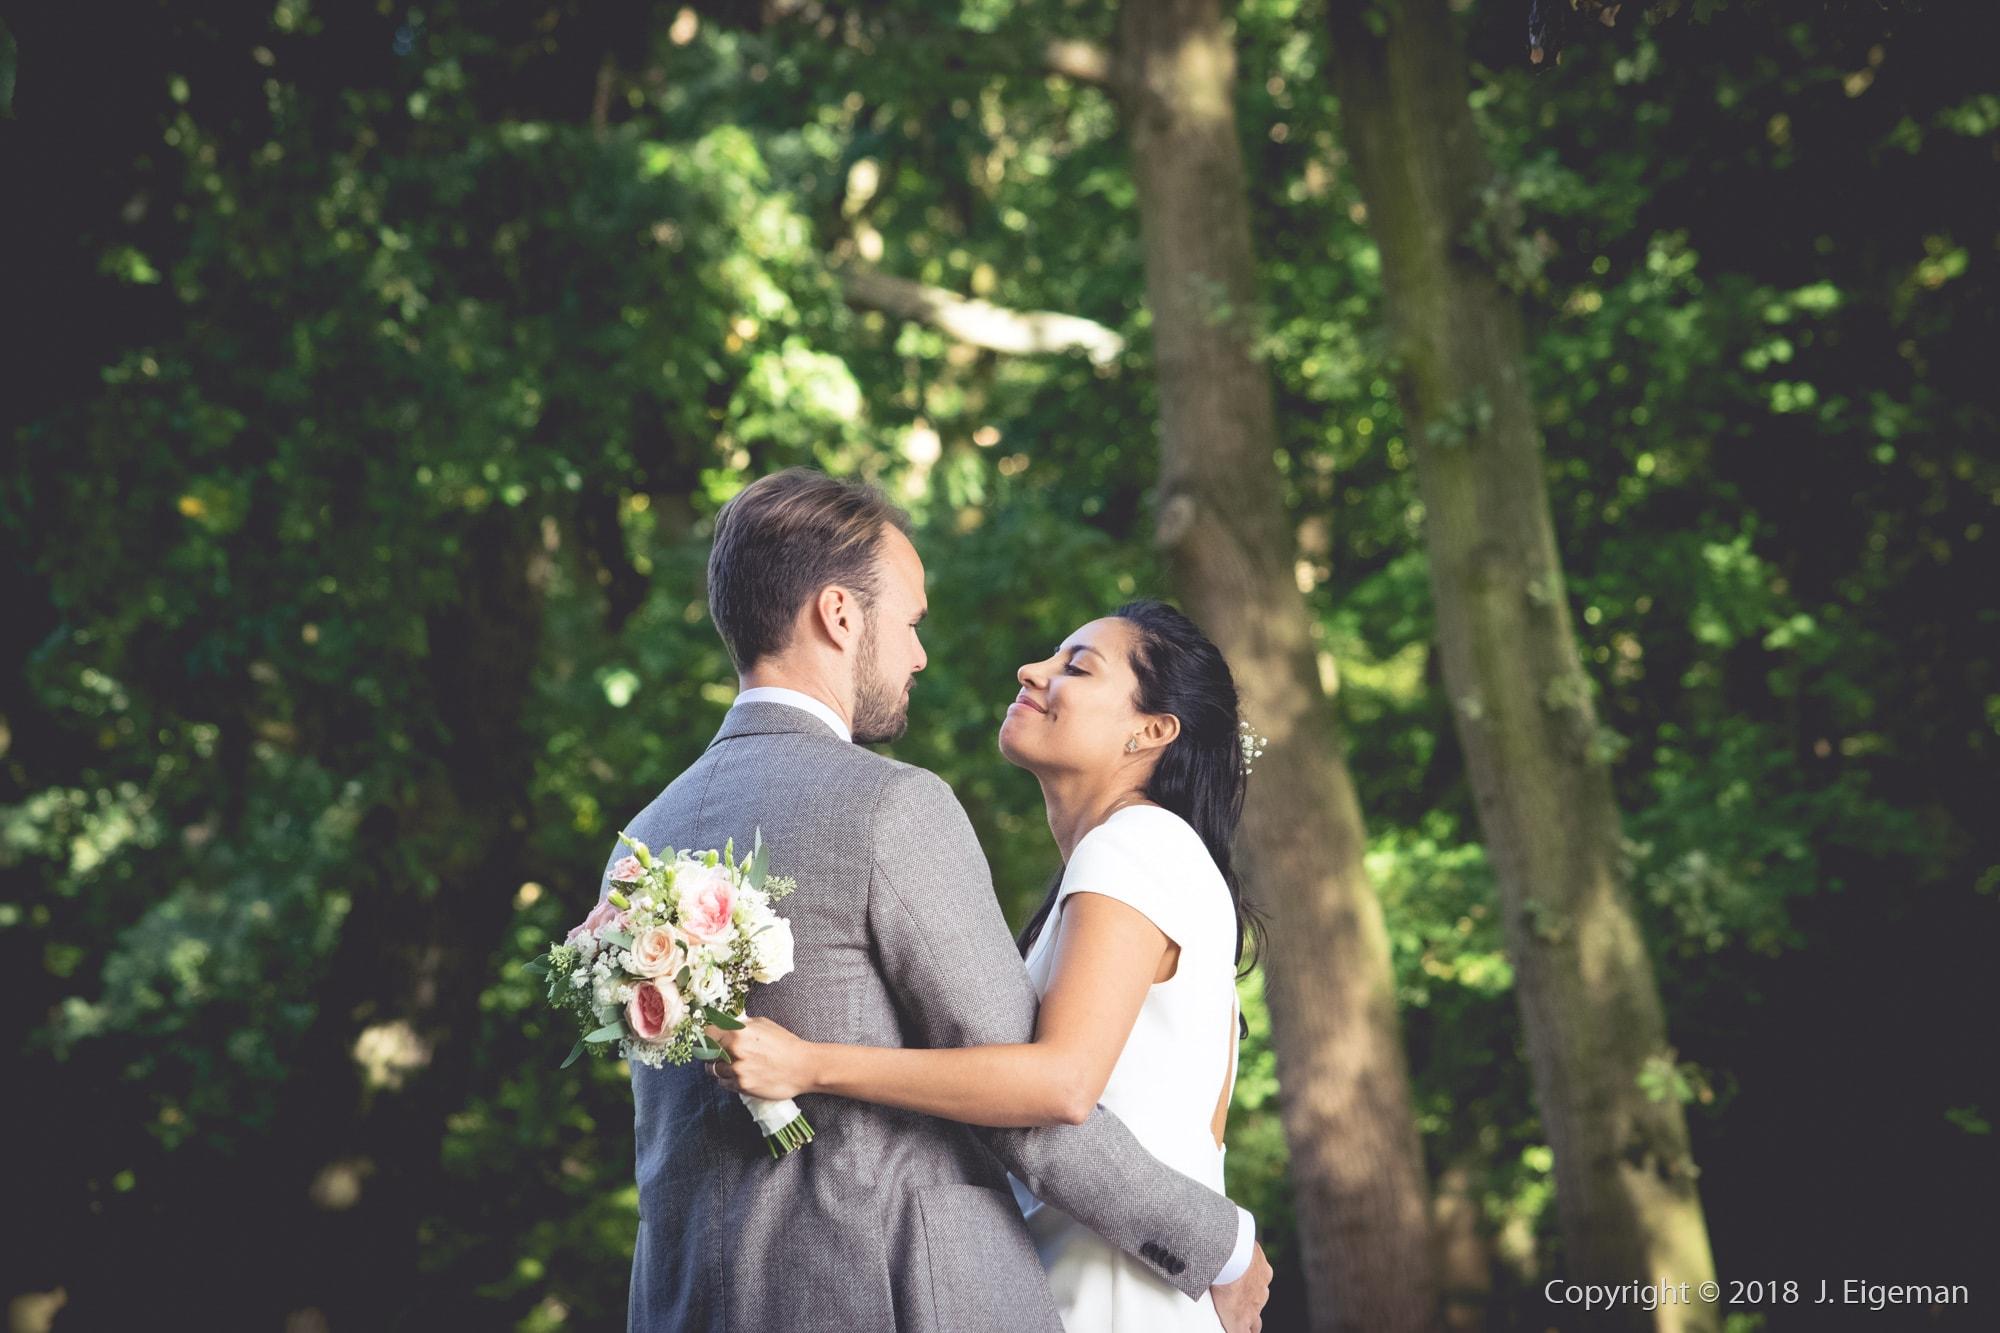 Bruiloft fotografie Poelgeest Oegtstgeest (3)